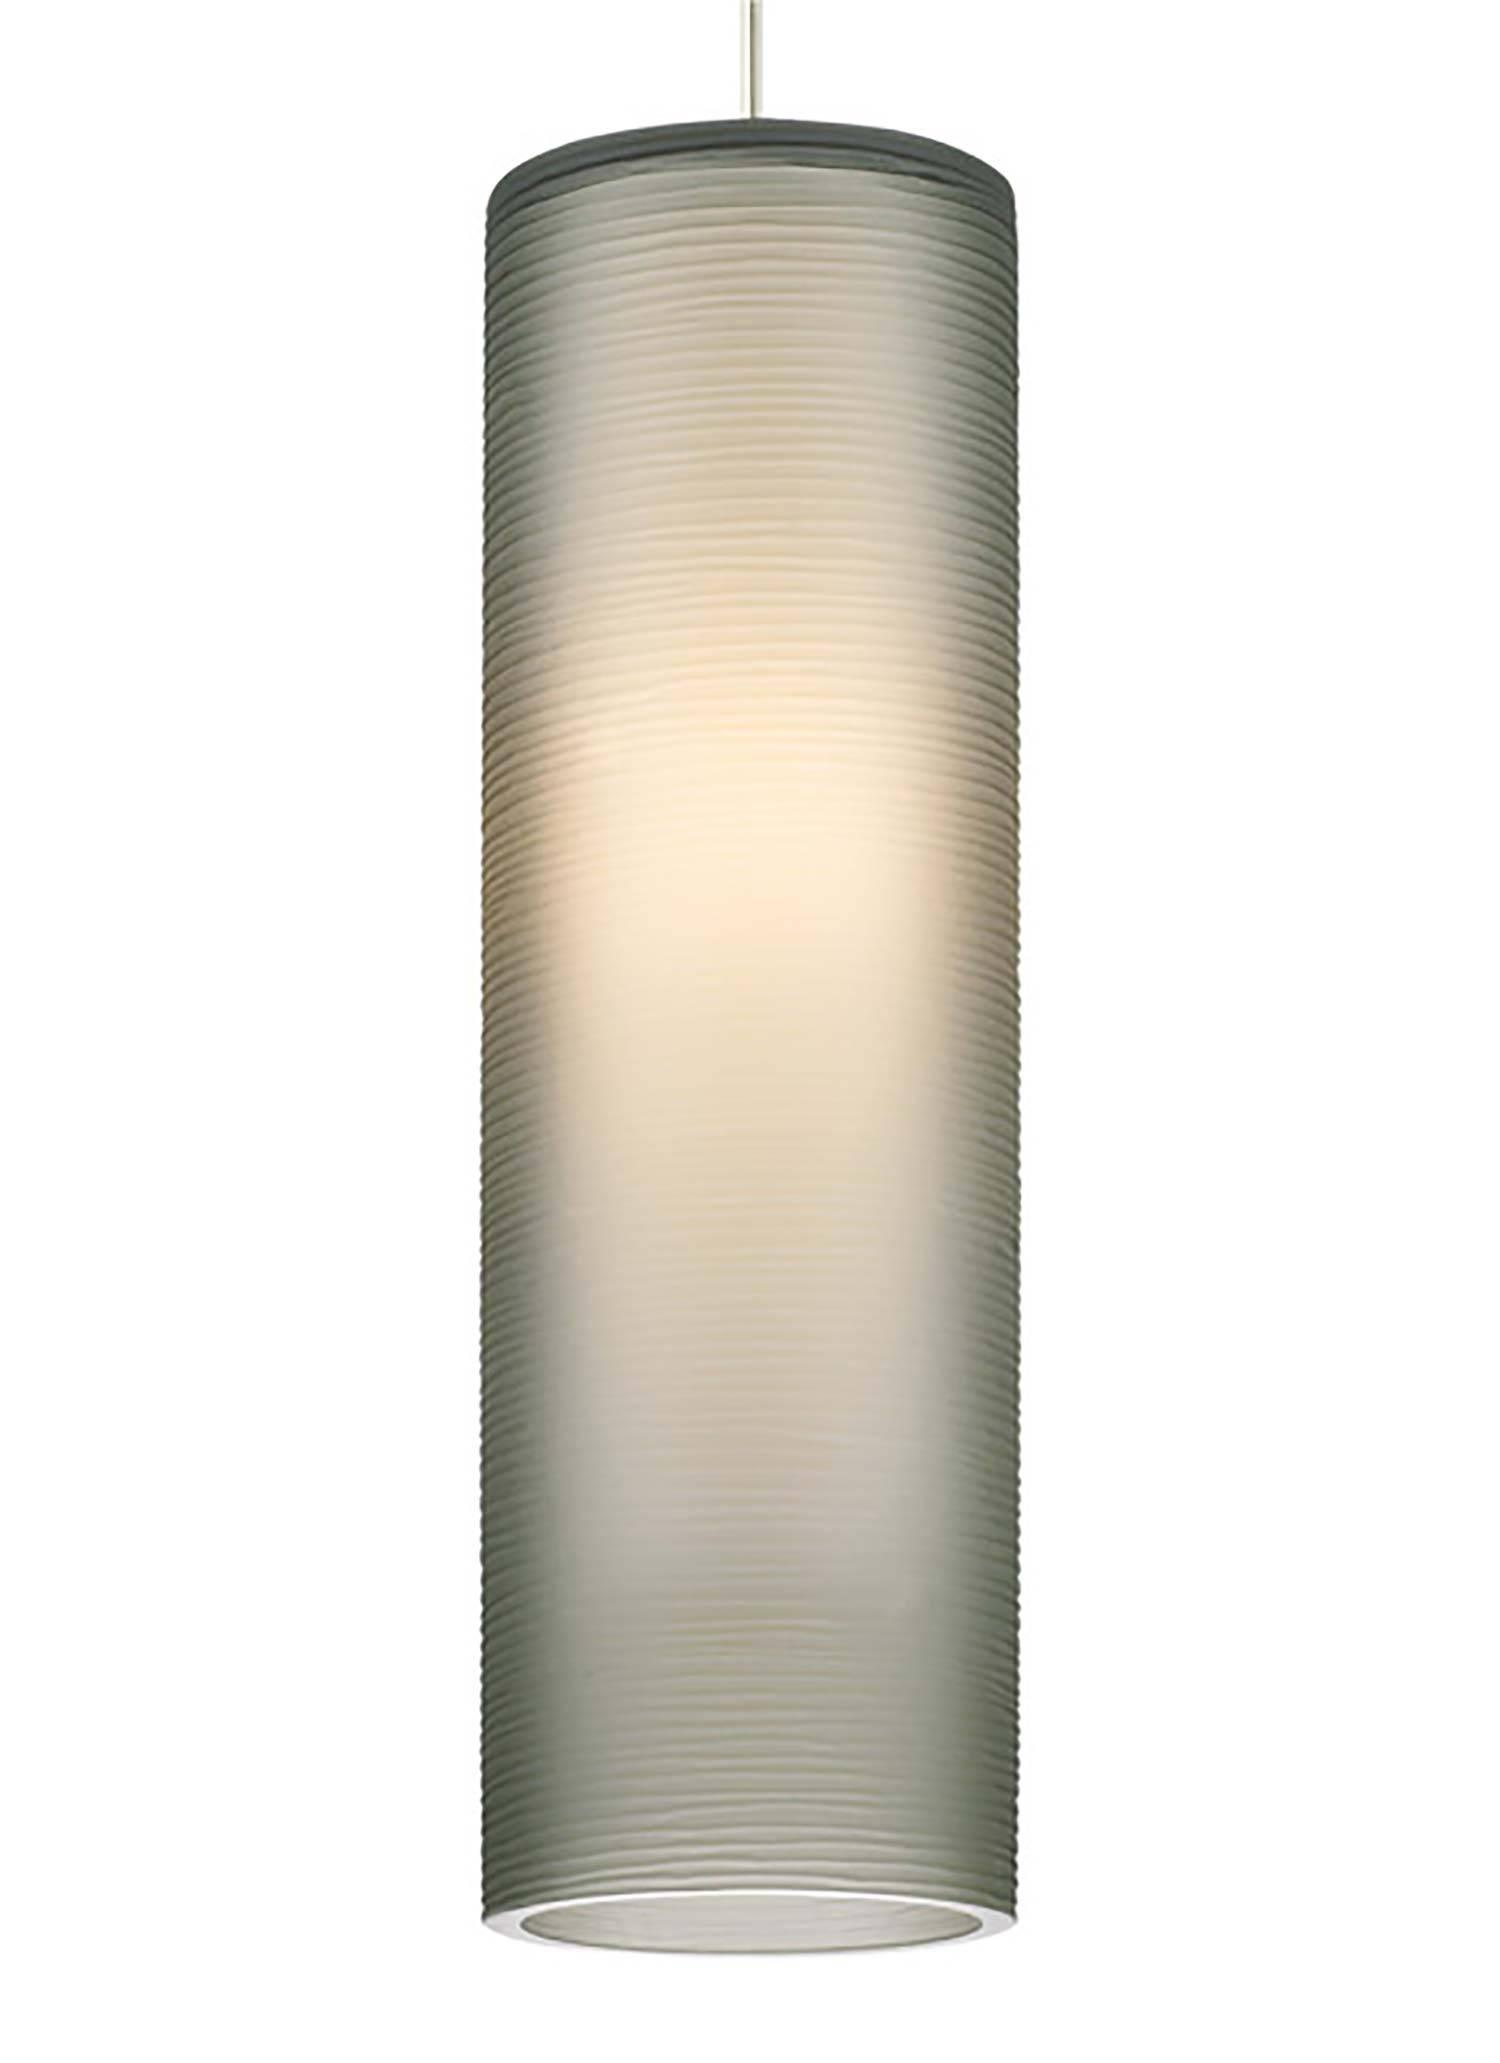 Tech Lighting 700mpbrgk Borrego Pendant Collection Low Voltage Throughout Tech Lighting Low Voltage Pendants (View 11 of 15)